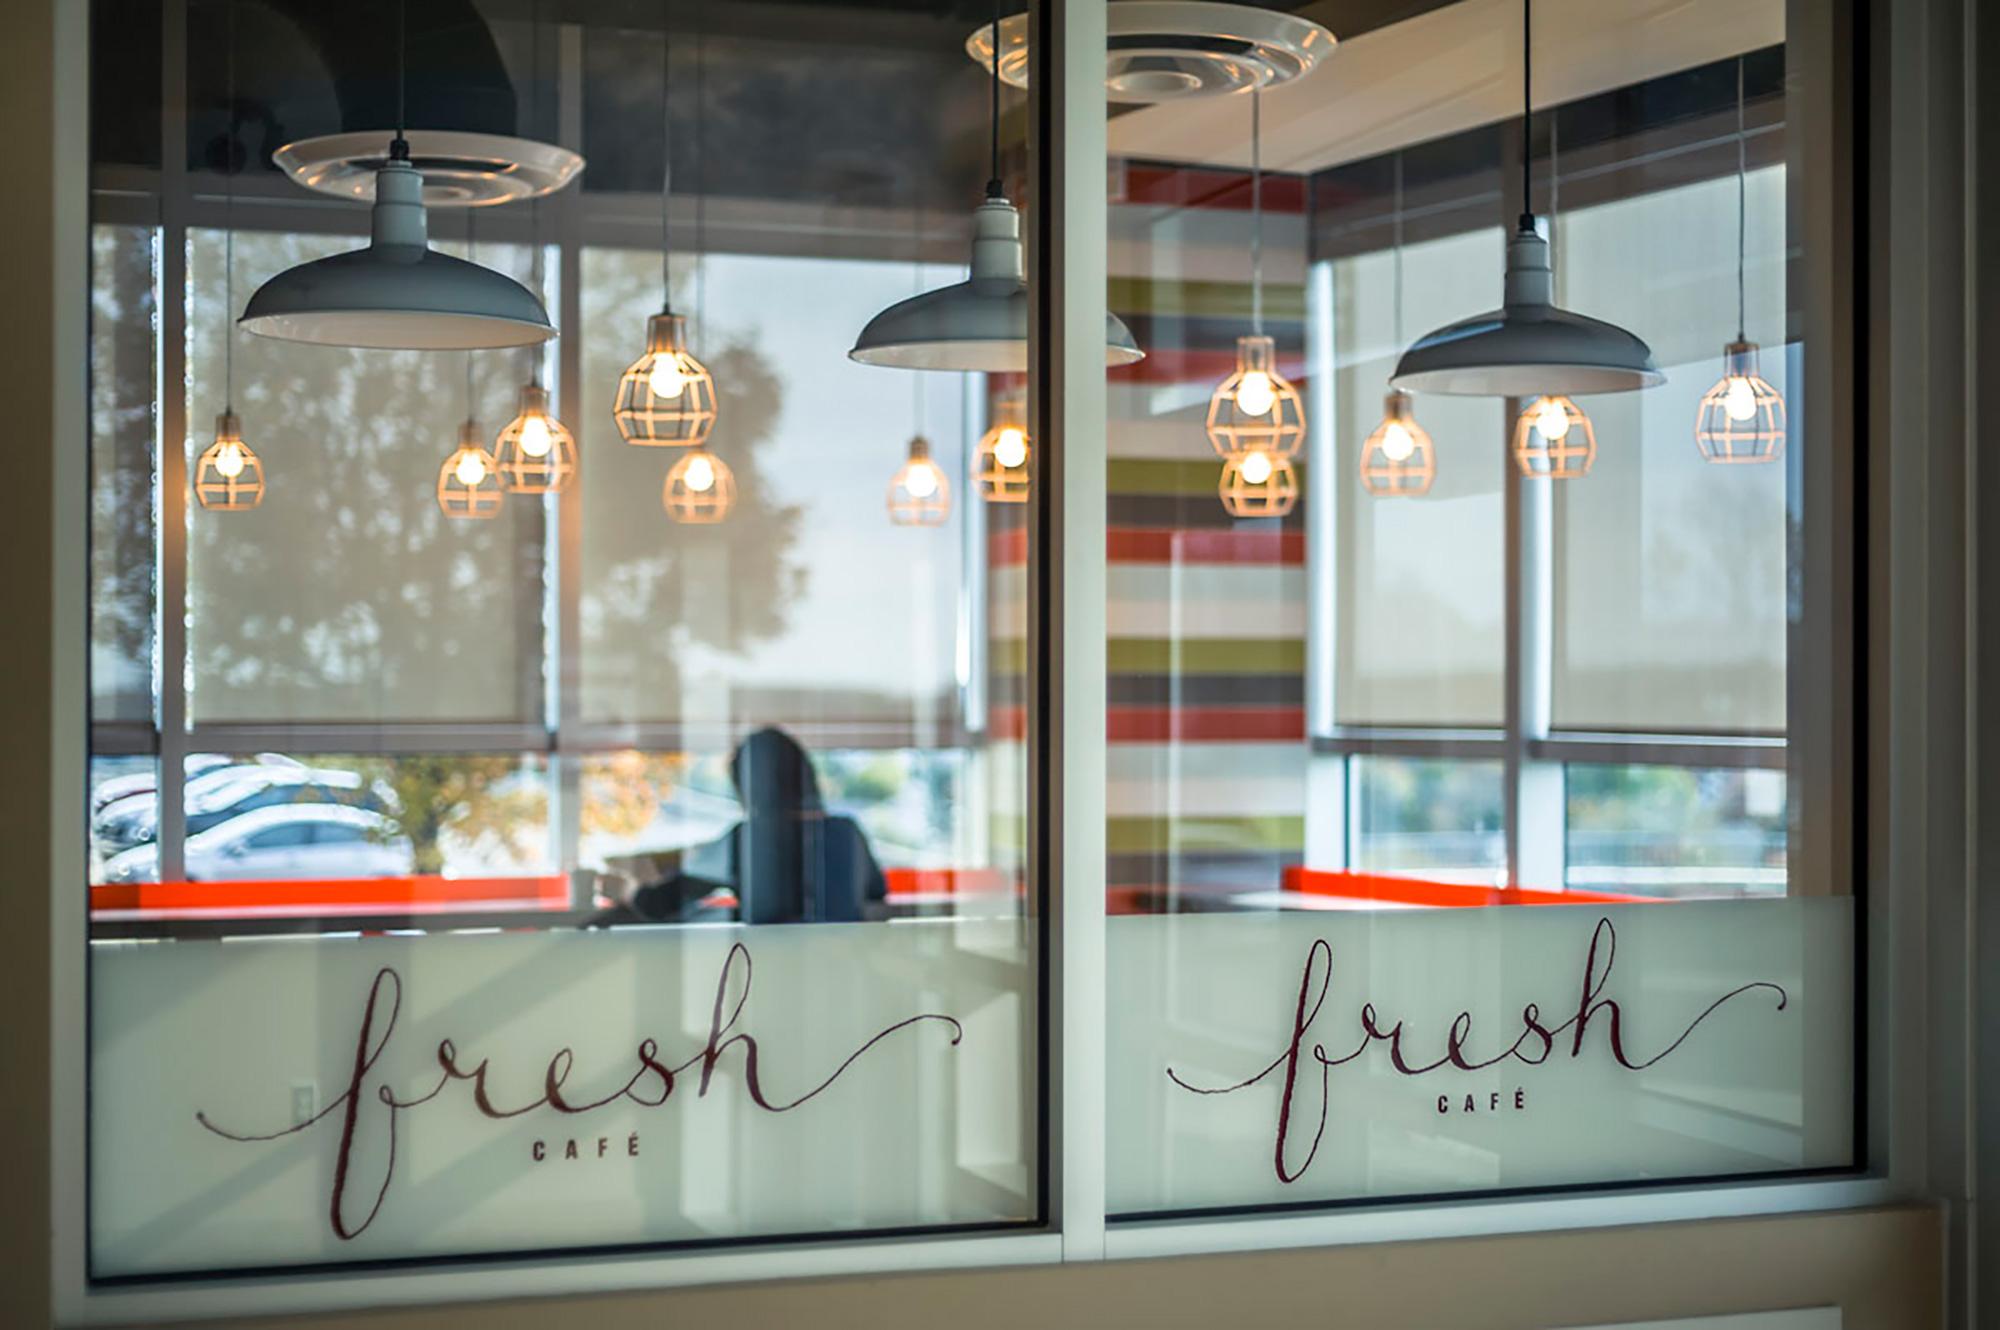 interior-design-halifax-cafe-window-display.jpg